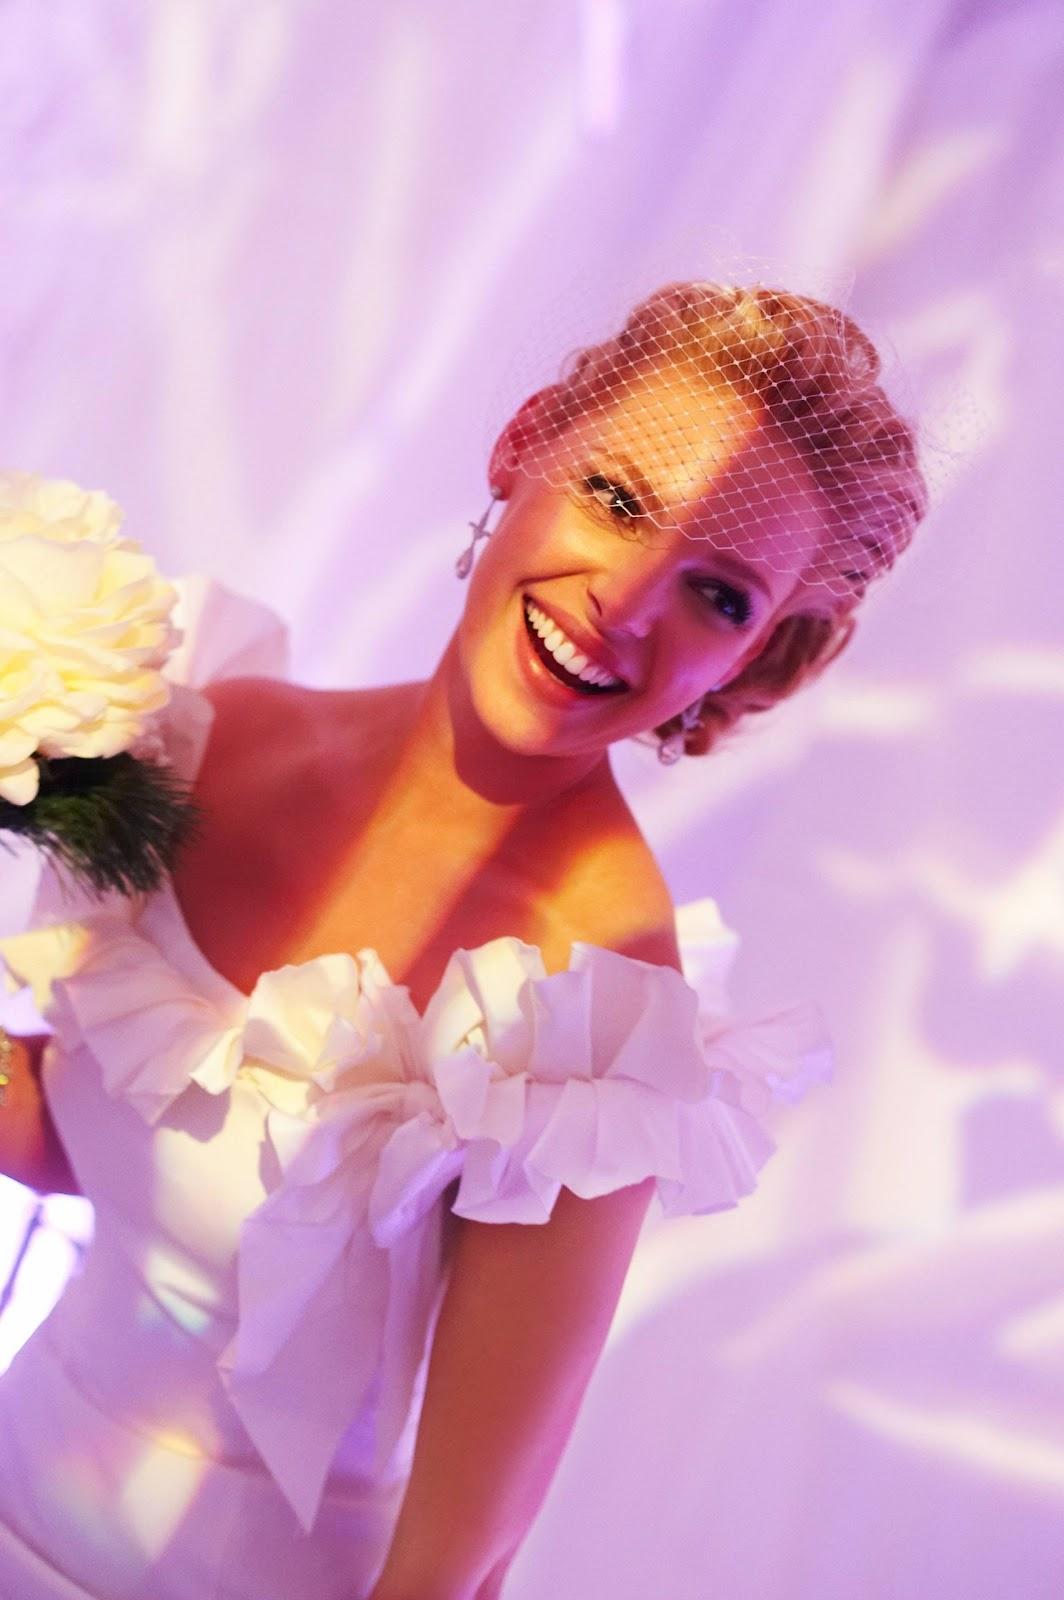 http://2.bp.blogspot.com/-zFKVvvtq64o/UFPFGwmgFeI/AAAAAAAAAn0/RQQHnrFG3Wo/s1600/Katherine-H-Josh-wedding-extra-katherine-heigl-1547252-1703-2560.jpg